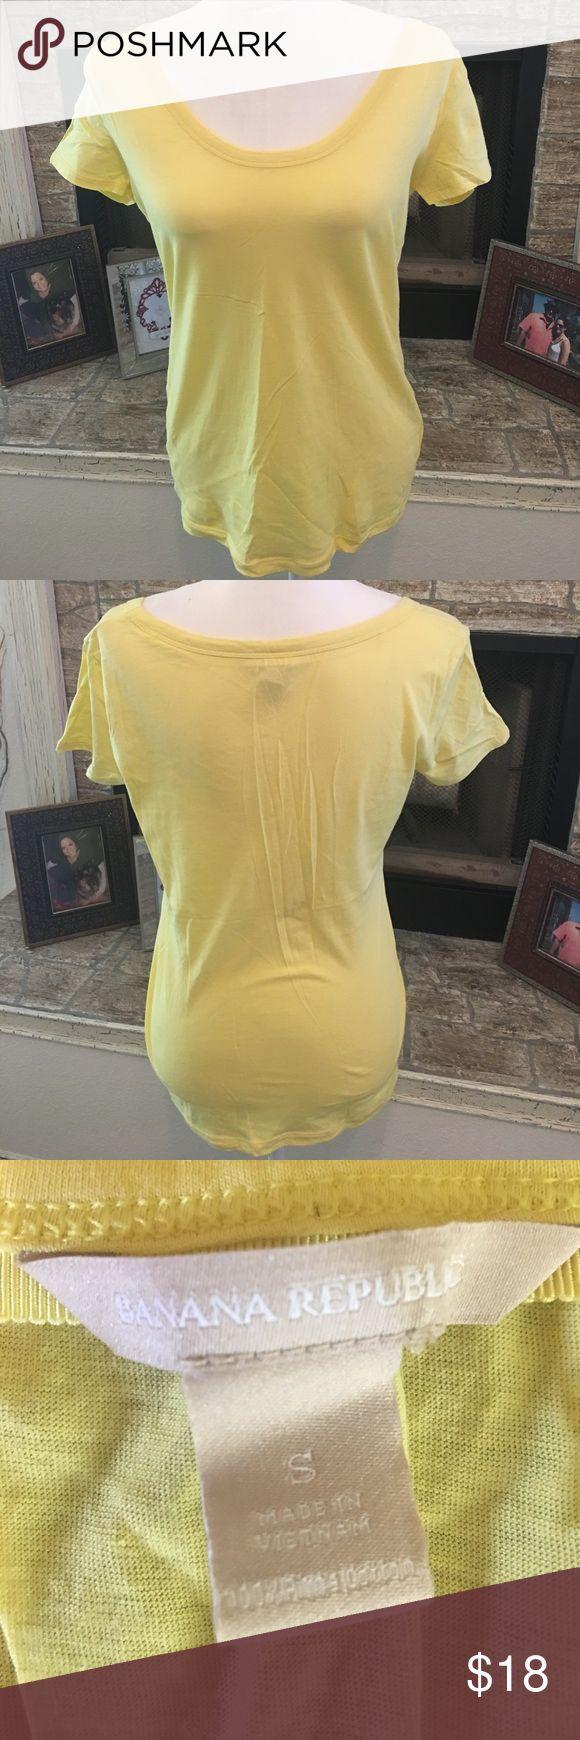 "Banana Republic yellow tshirt Beautiful yellow Banana Republic tshirt. Flattering wide neckline. 17"" from armpit to armpit, 24"" from shoulder to bottom Banana Republic Tops Tees - Short Sleeve"